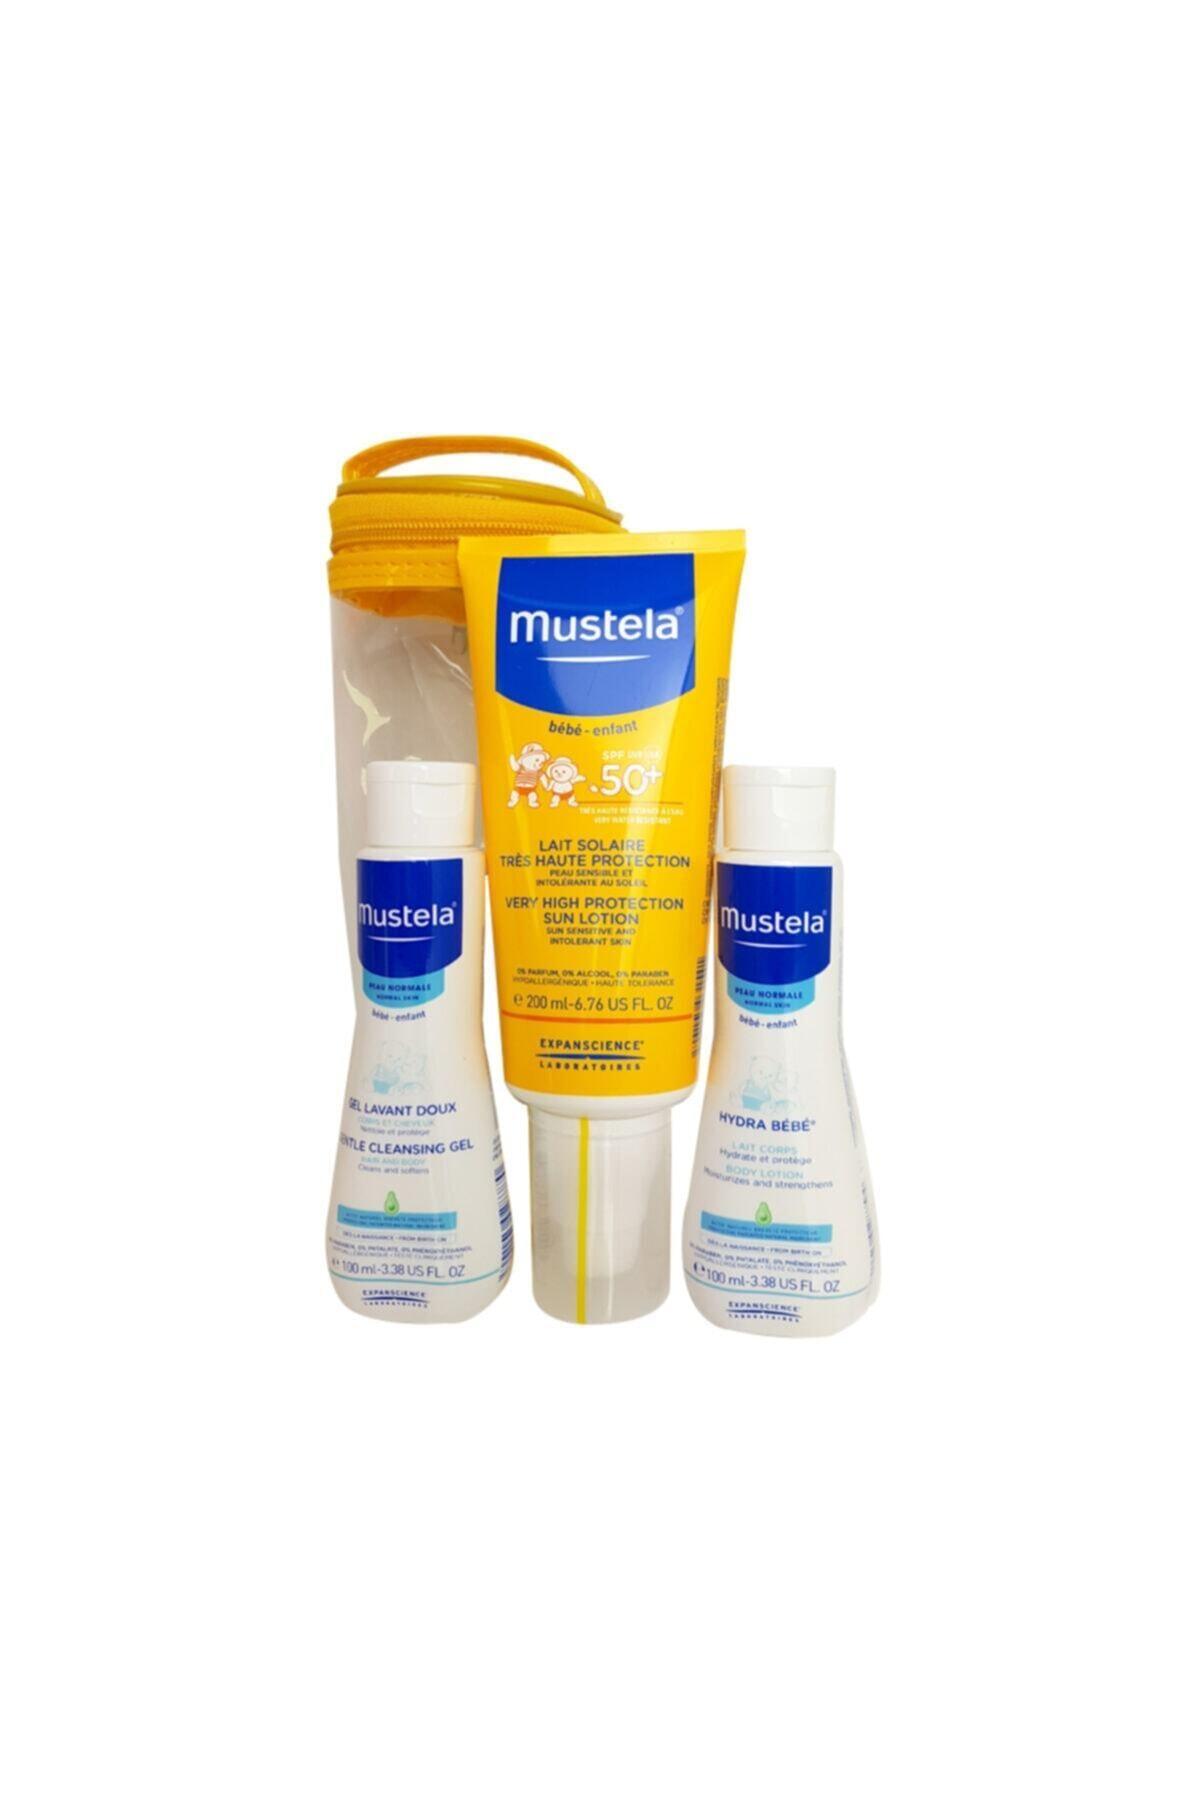 Mustela High Protection Spf50 200ml Set 1